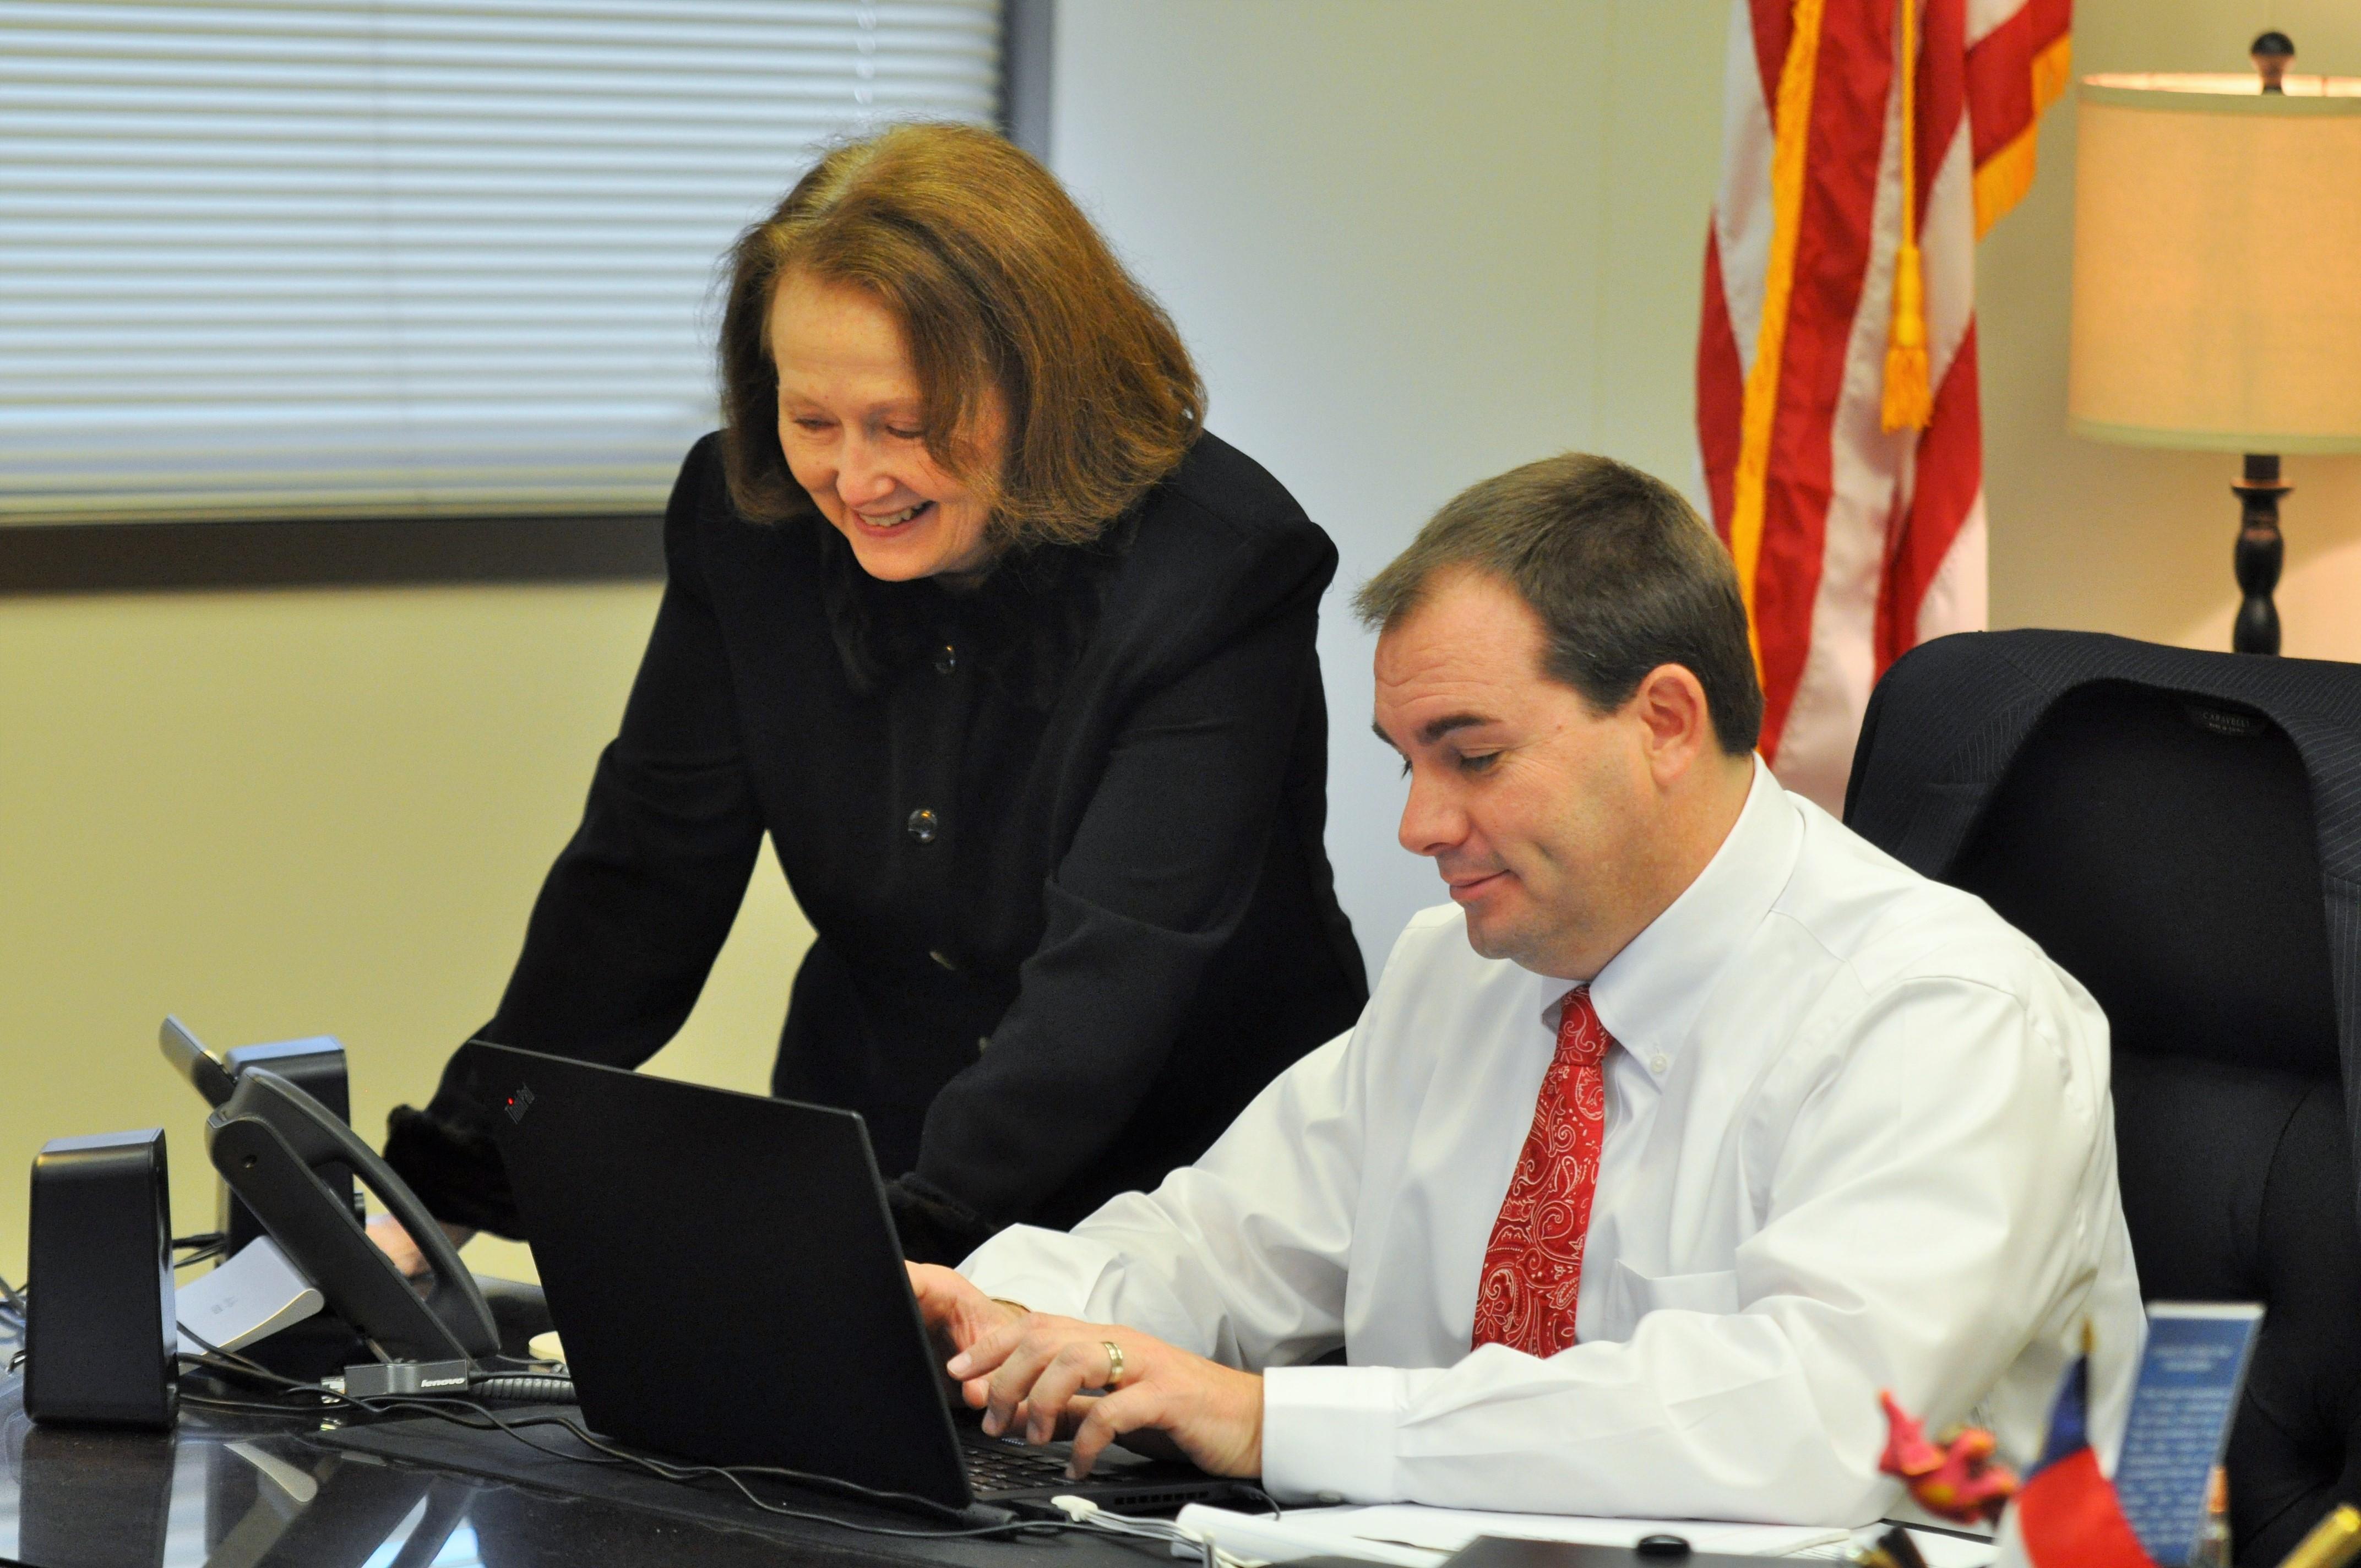 John Bell: Great Representation For Wayne County - NBWD Testing